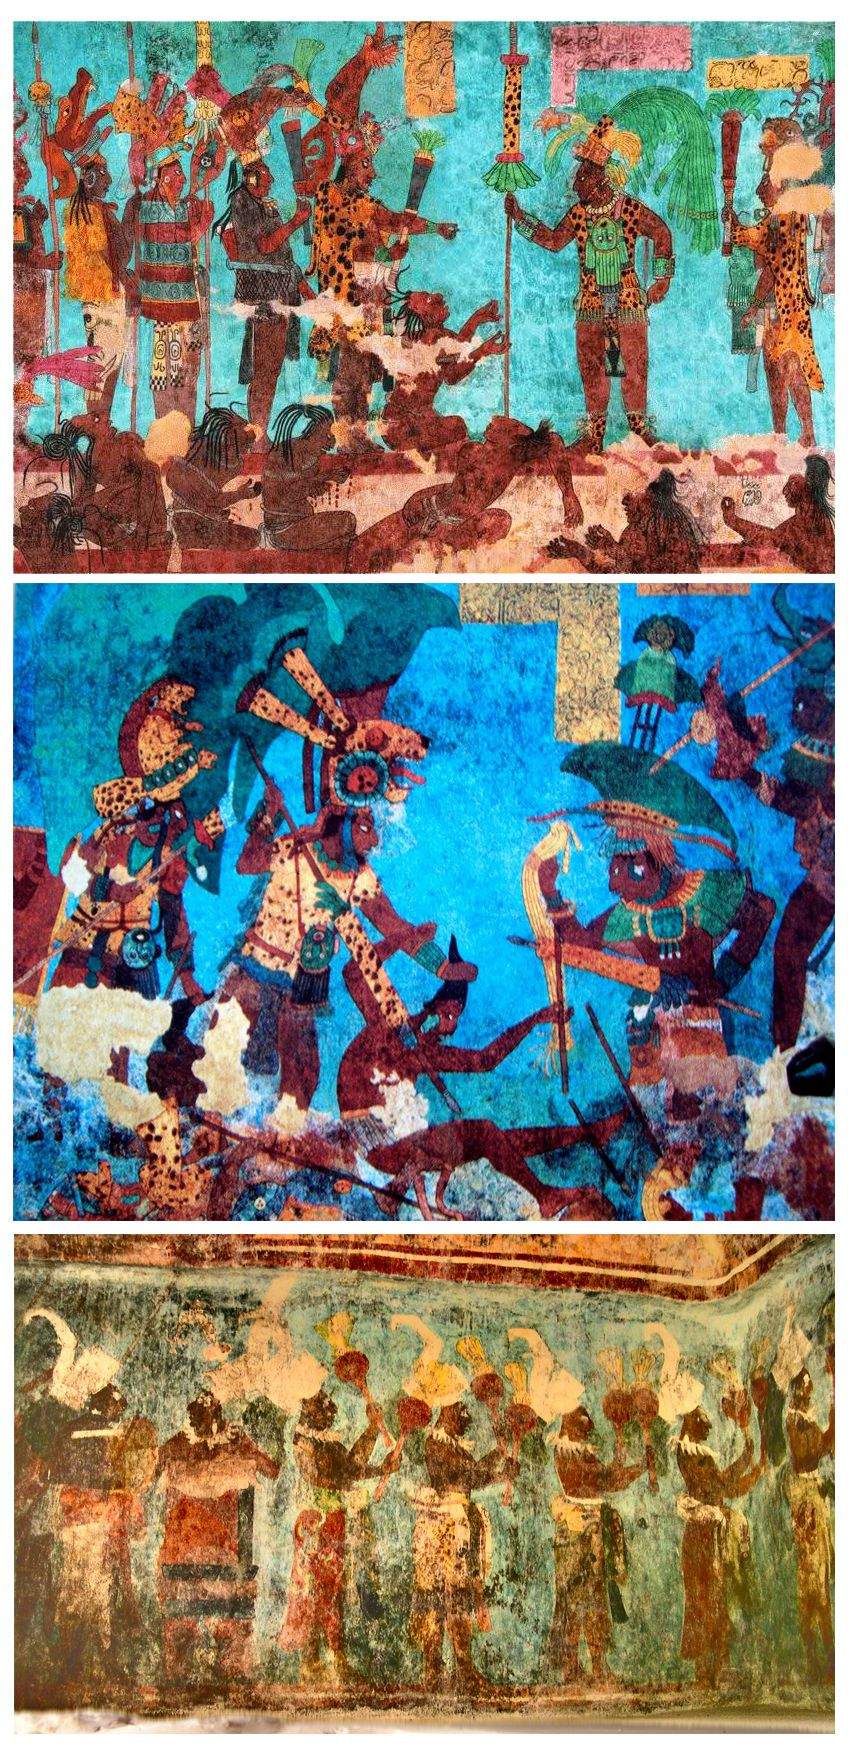 Anonimo Murales De Bonampak Fresco Sobre Estuco Siglo Viii D C